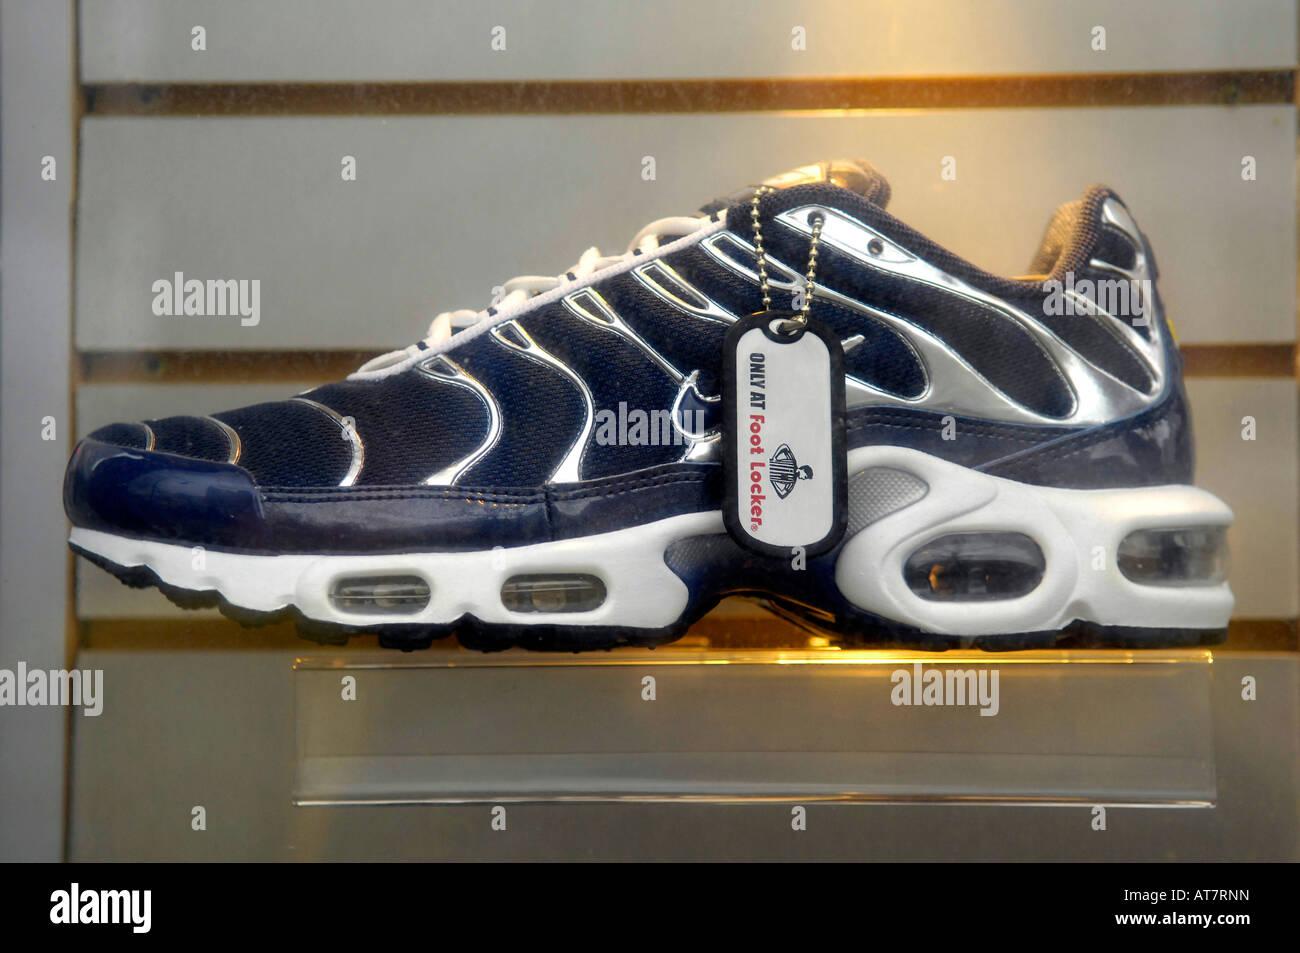 new arrivals 1f0a5 fbe6d nike sports shoe trainer blue modern footwear american foot ...